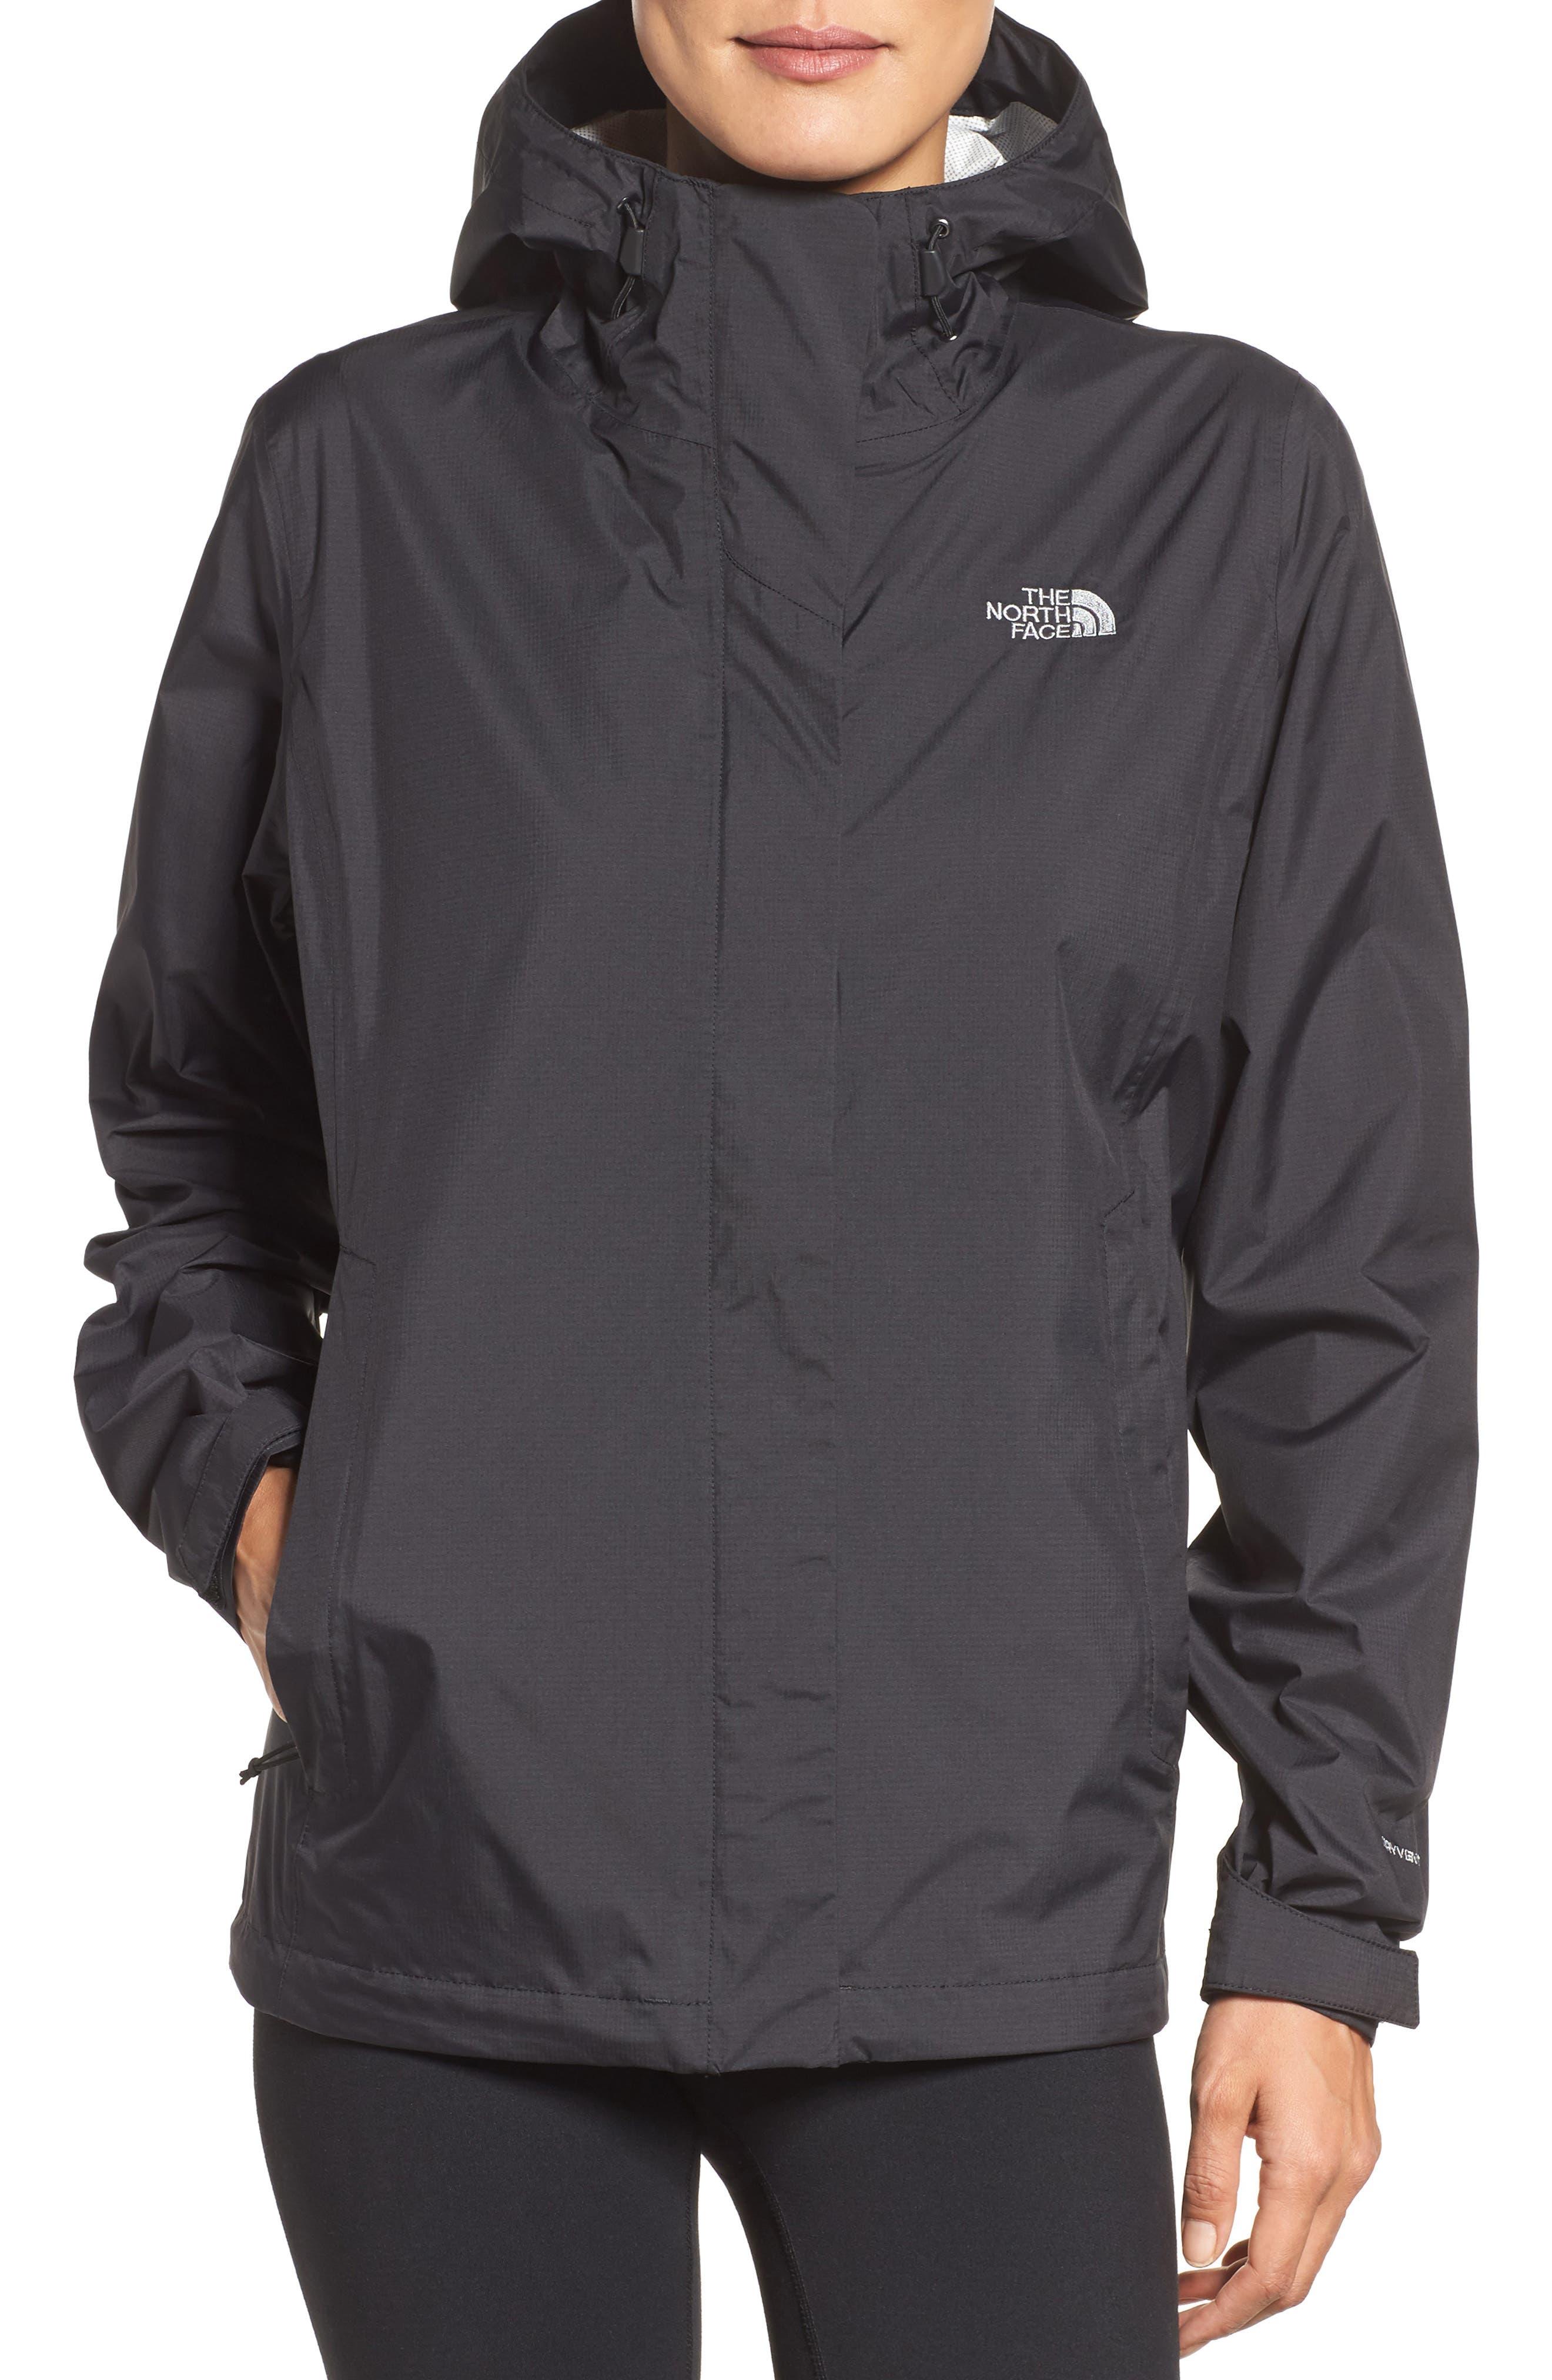 Venture 2 Waterproof Jacket,                         Main,                         color, Tnf Black